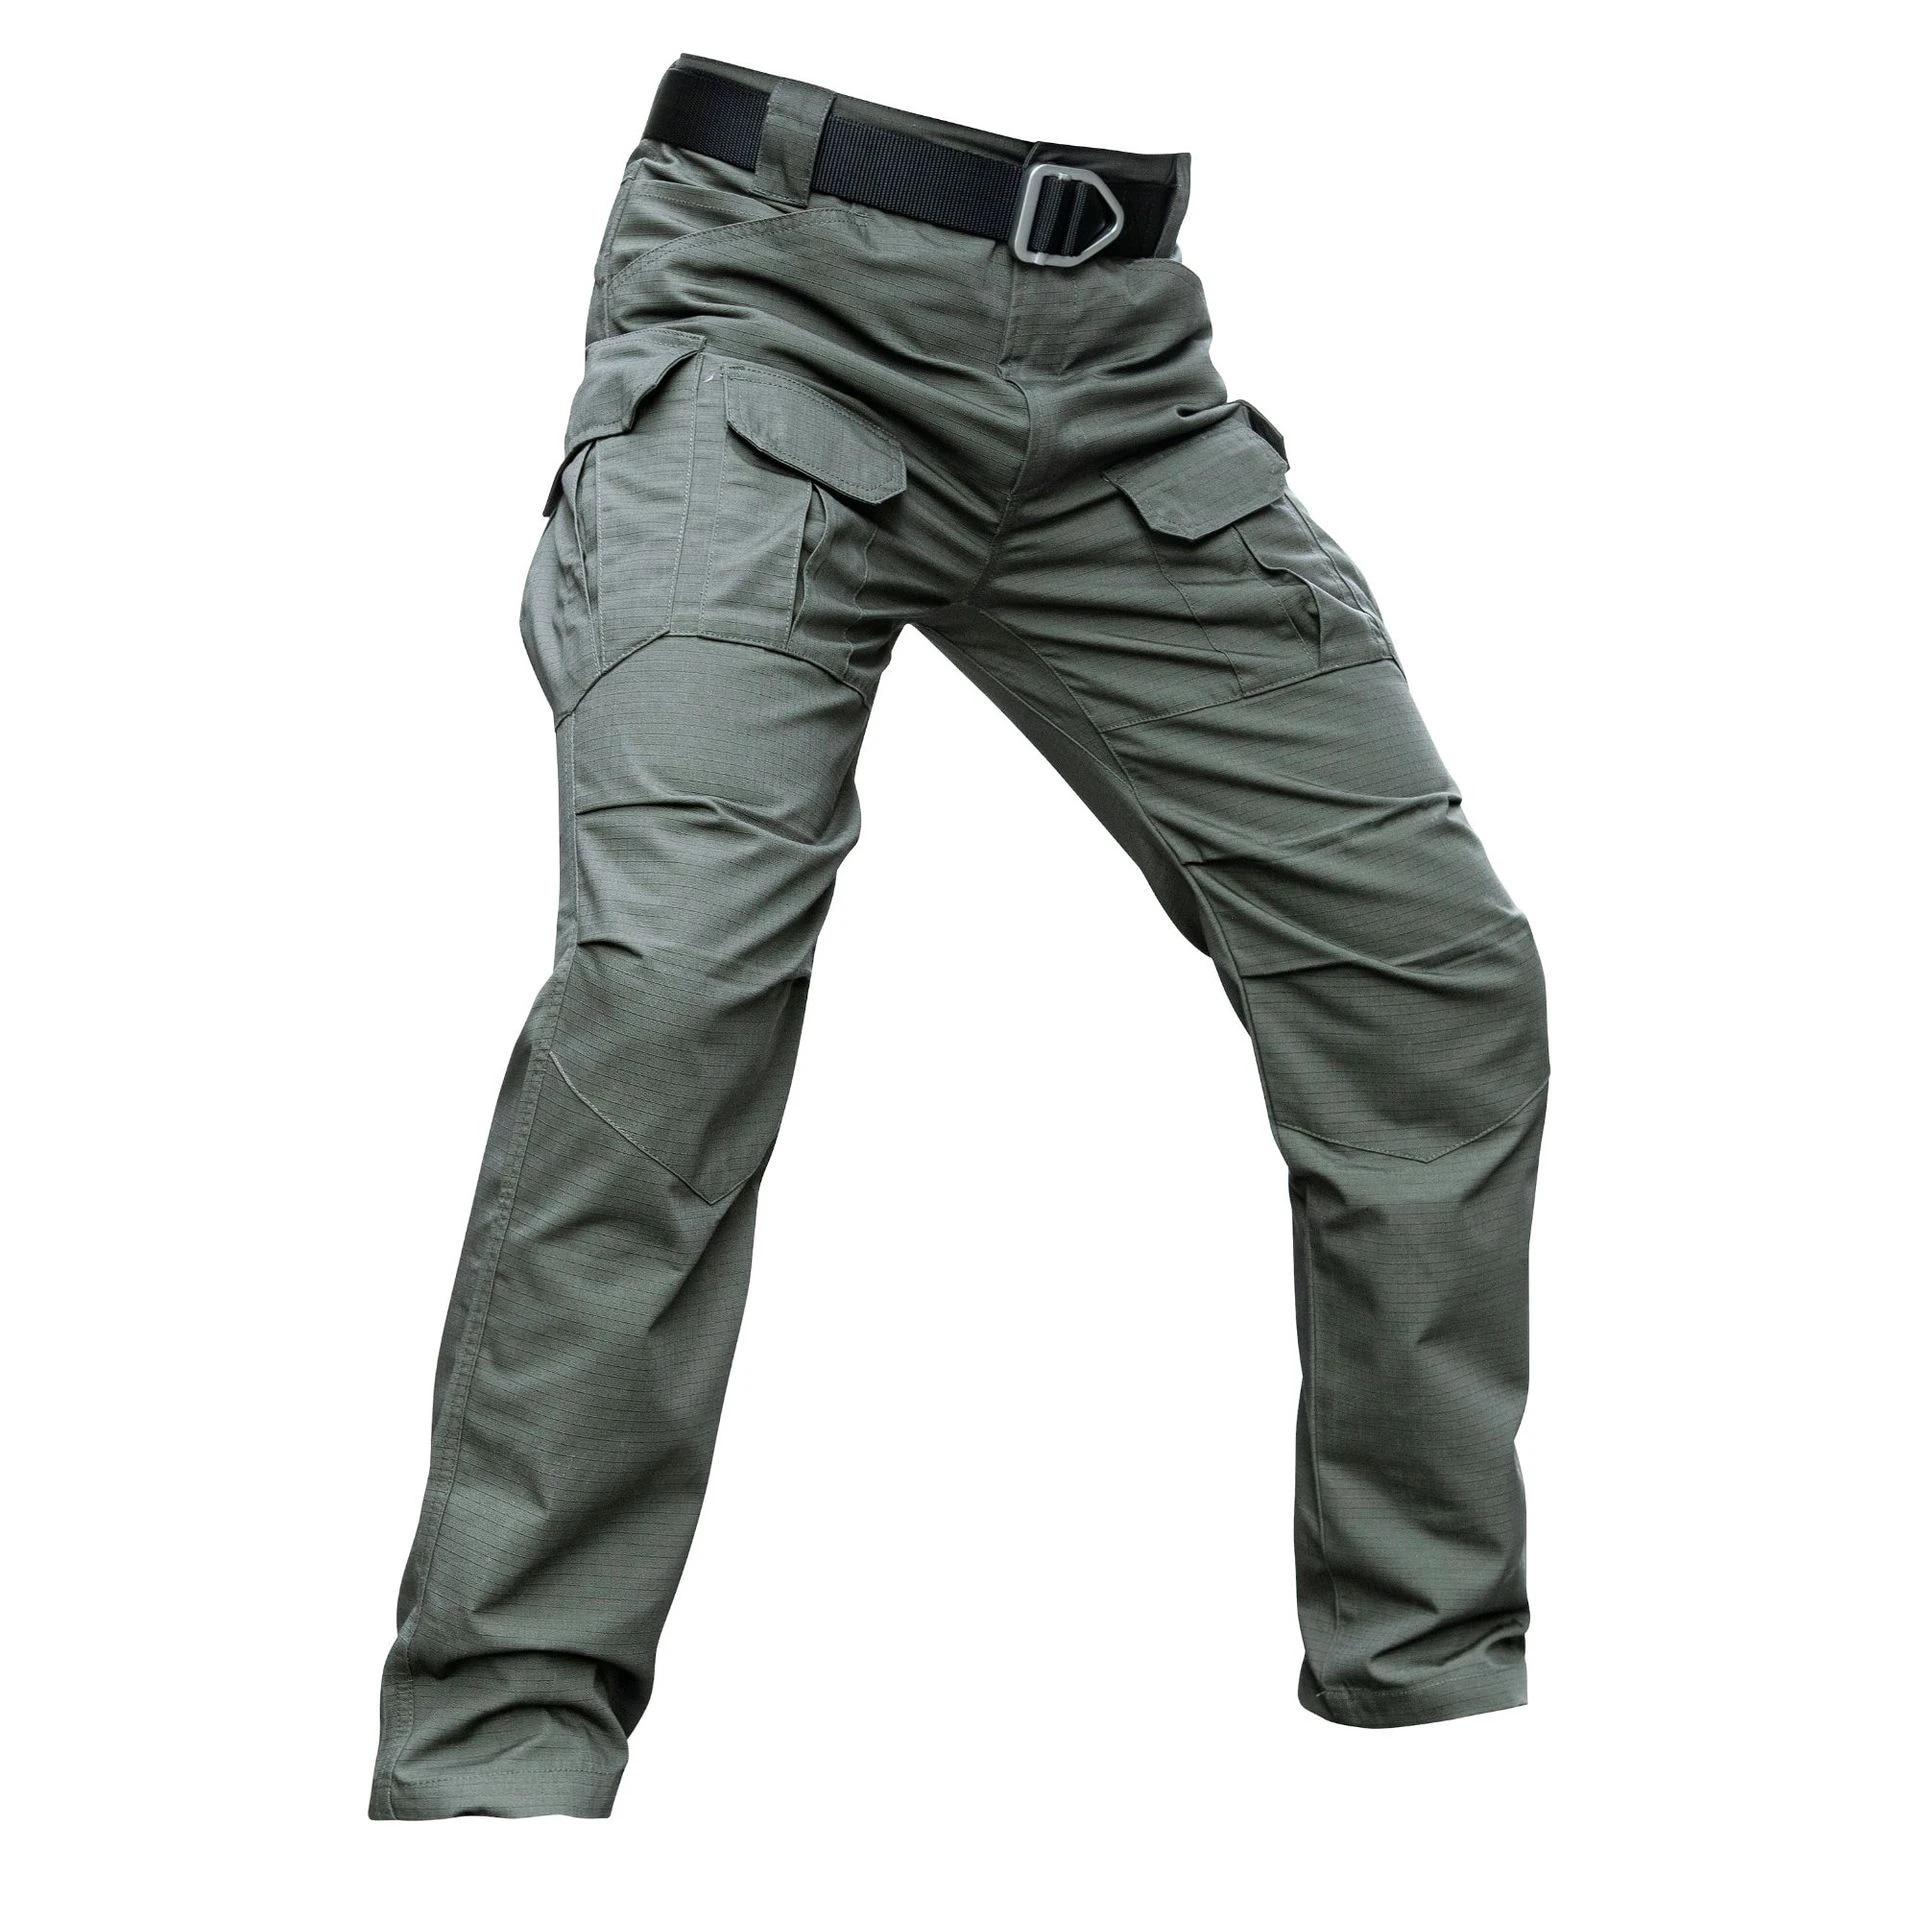 Black Cargo Tactical Pants